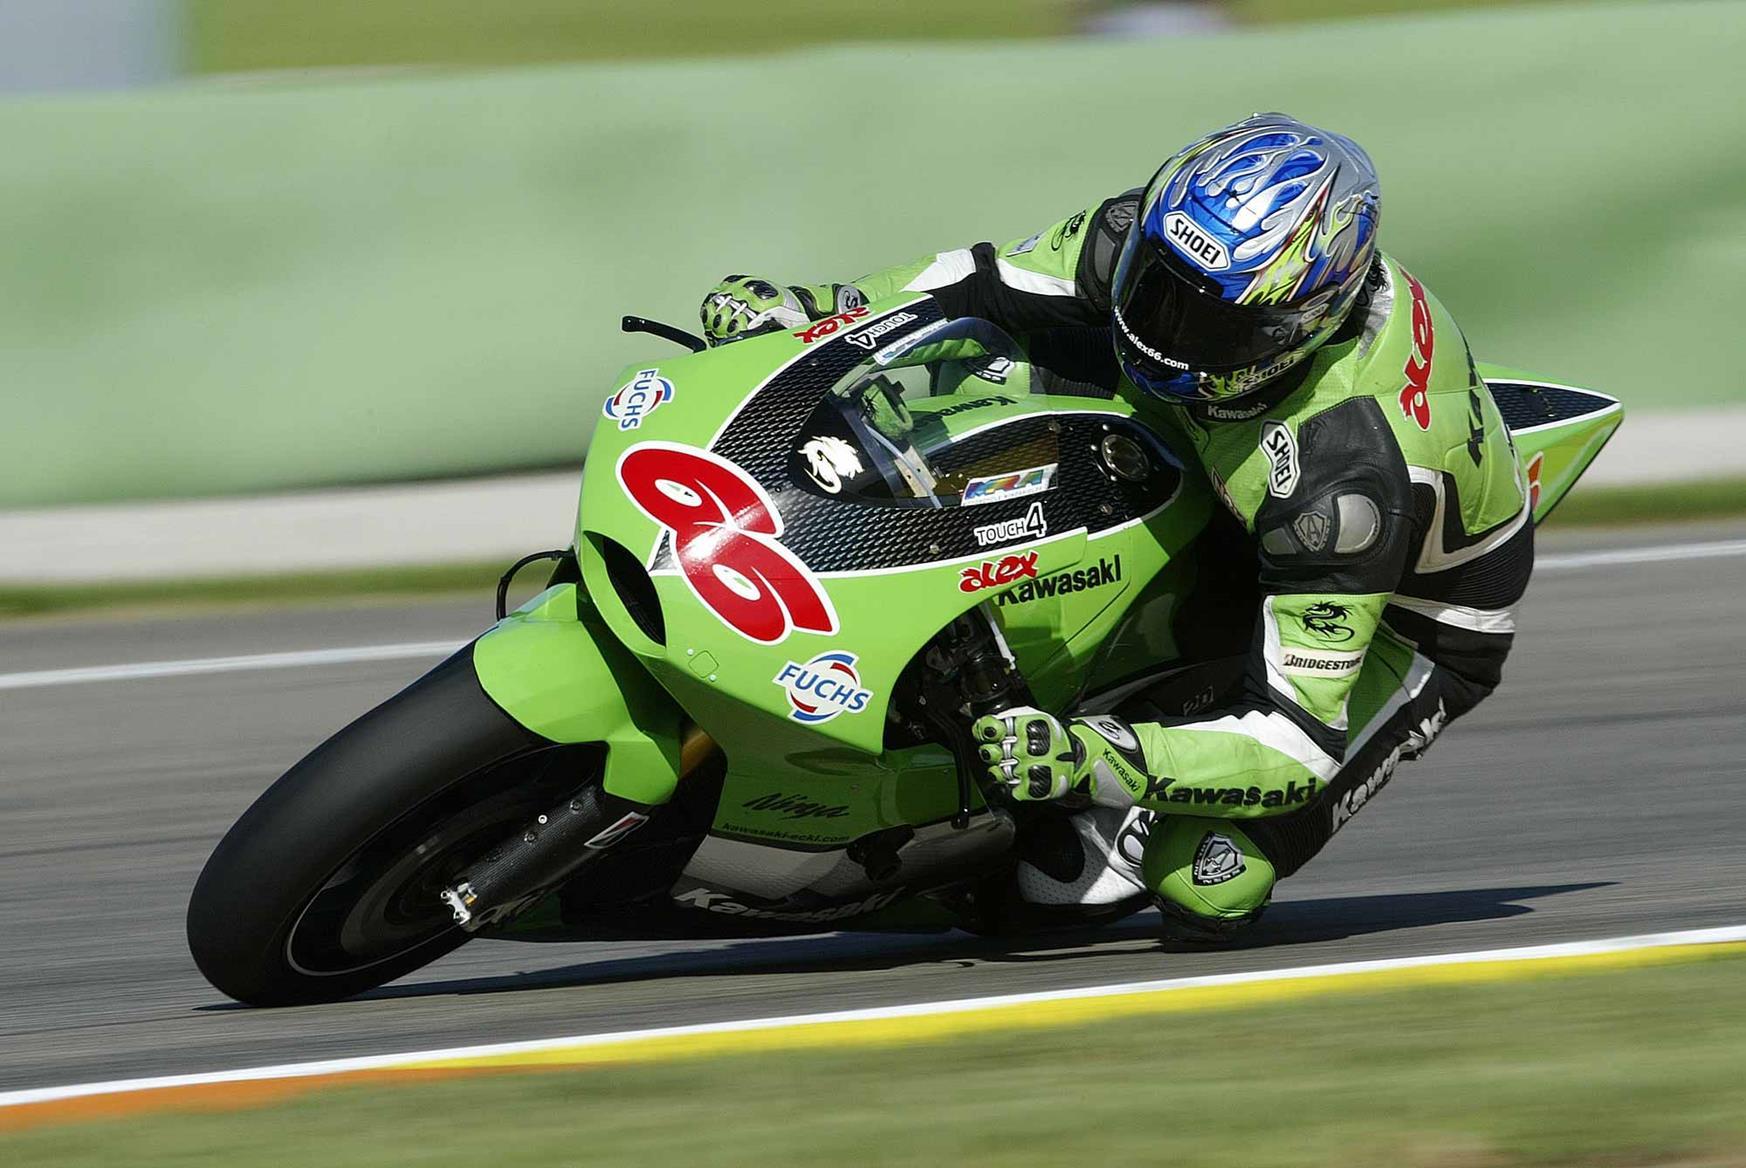 Alex Hofmann was a factory Kawasaki rider